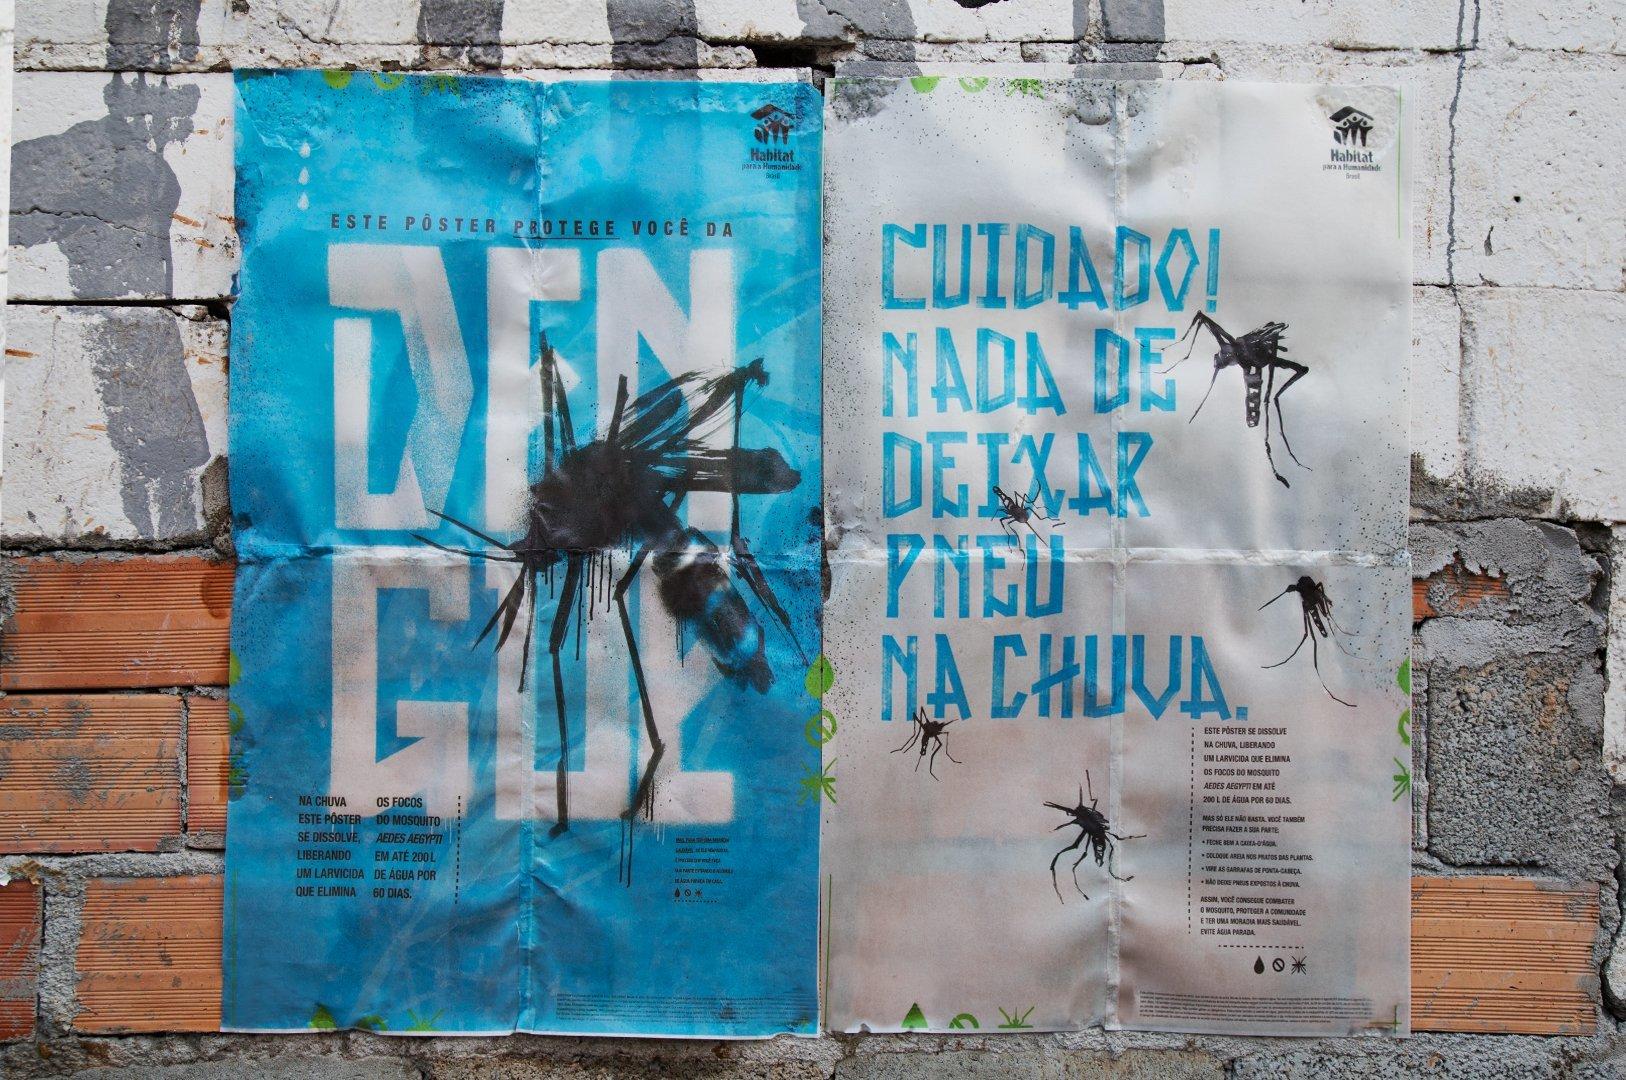 larva_habitat for humanity_betc sao paolo_the dissolving poster_brezilay_bigumigu_